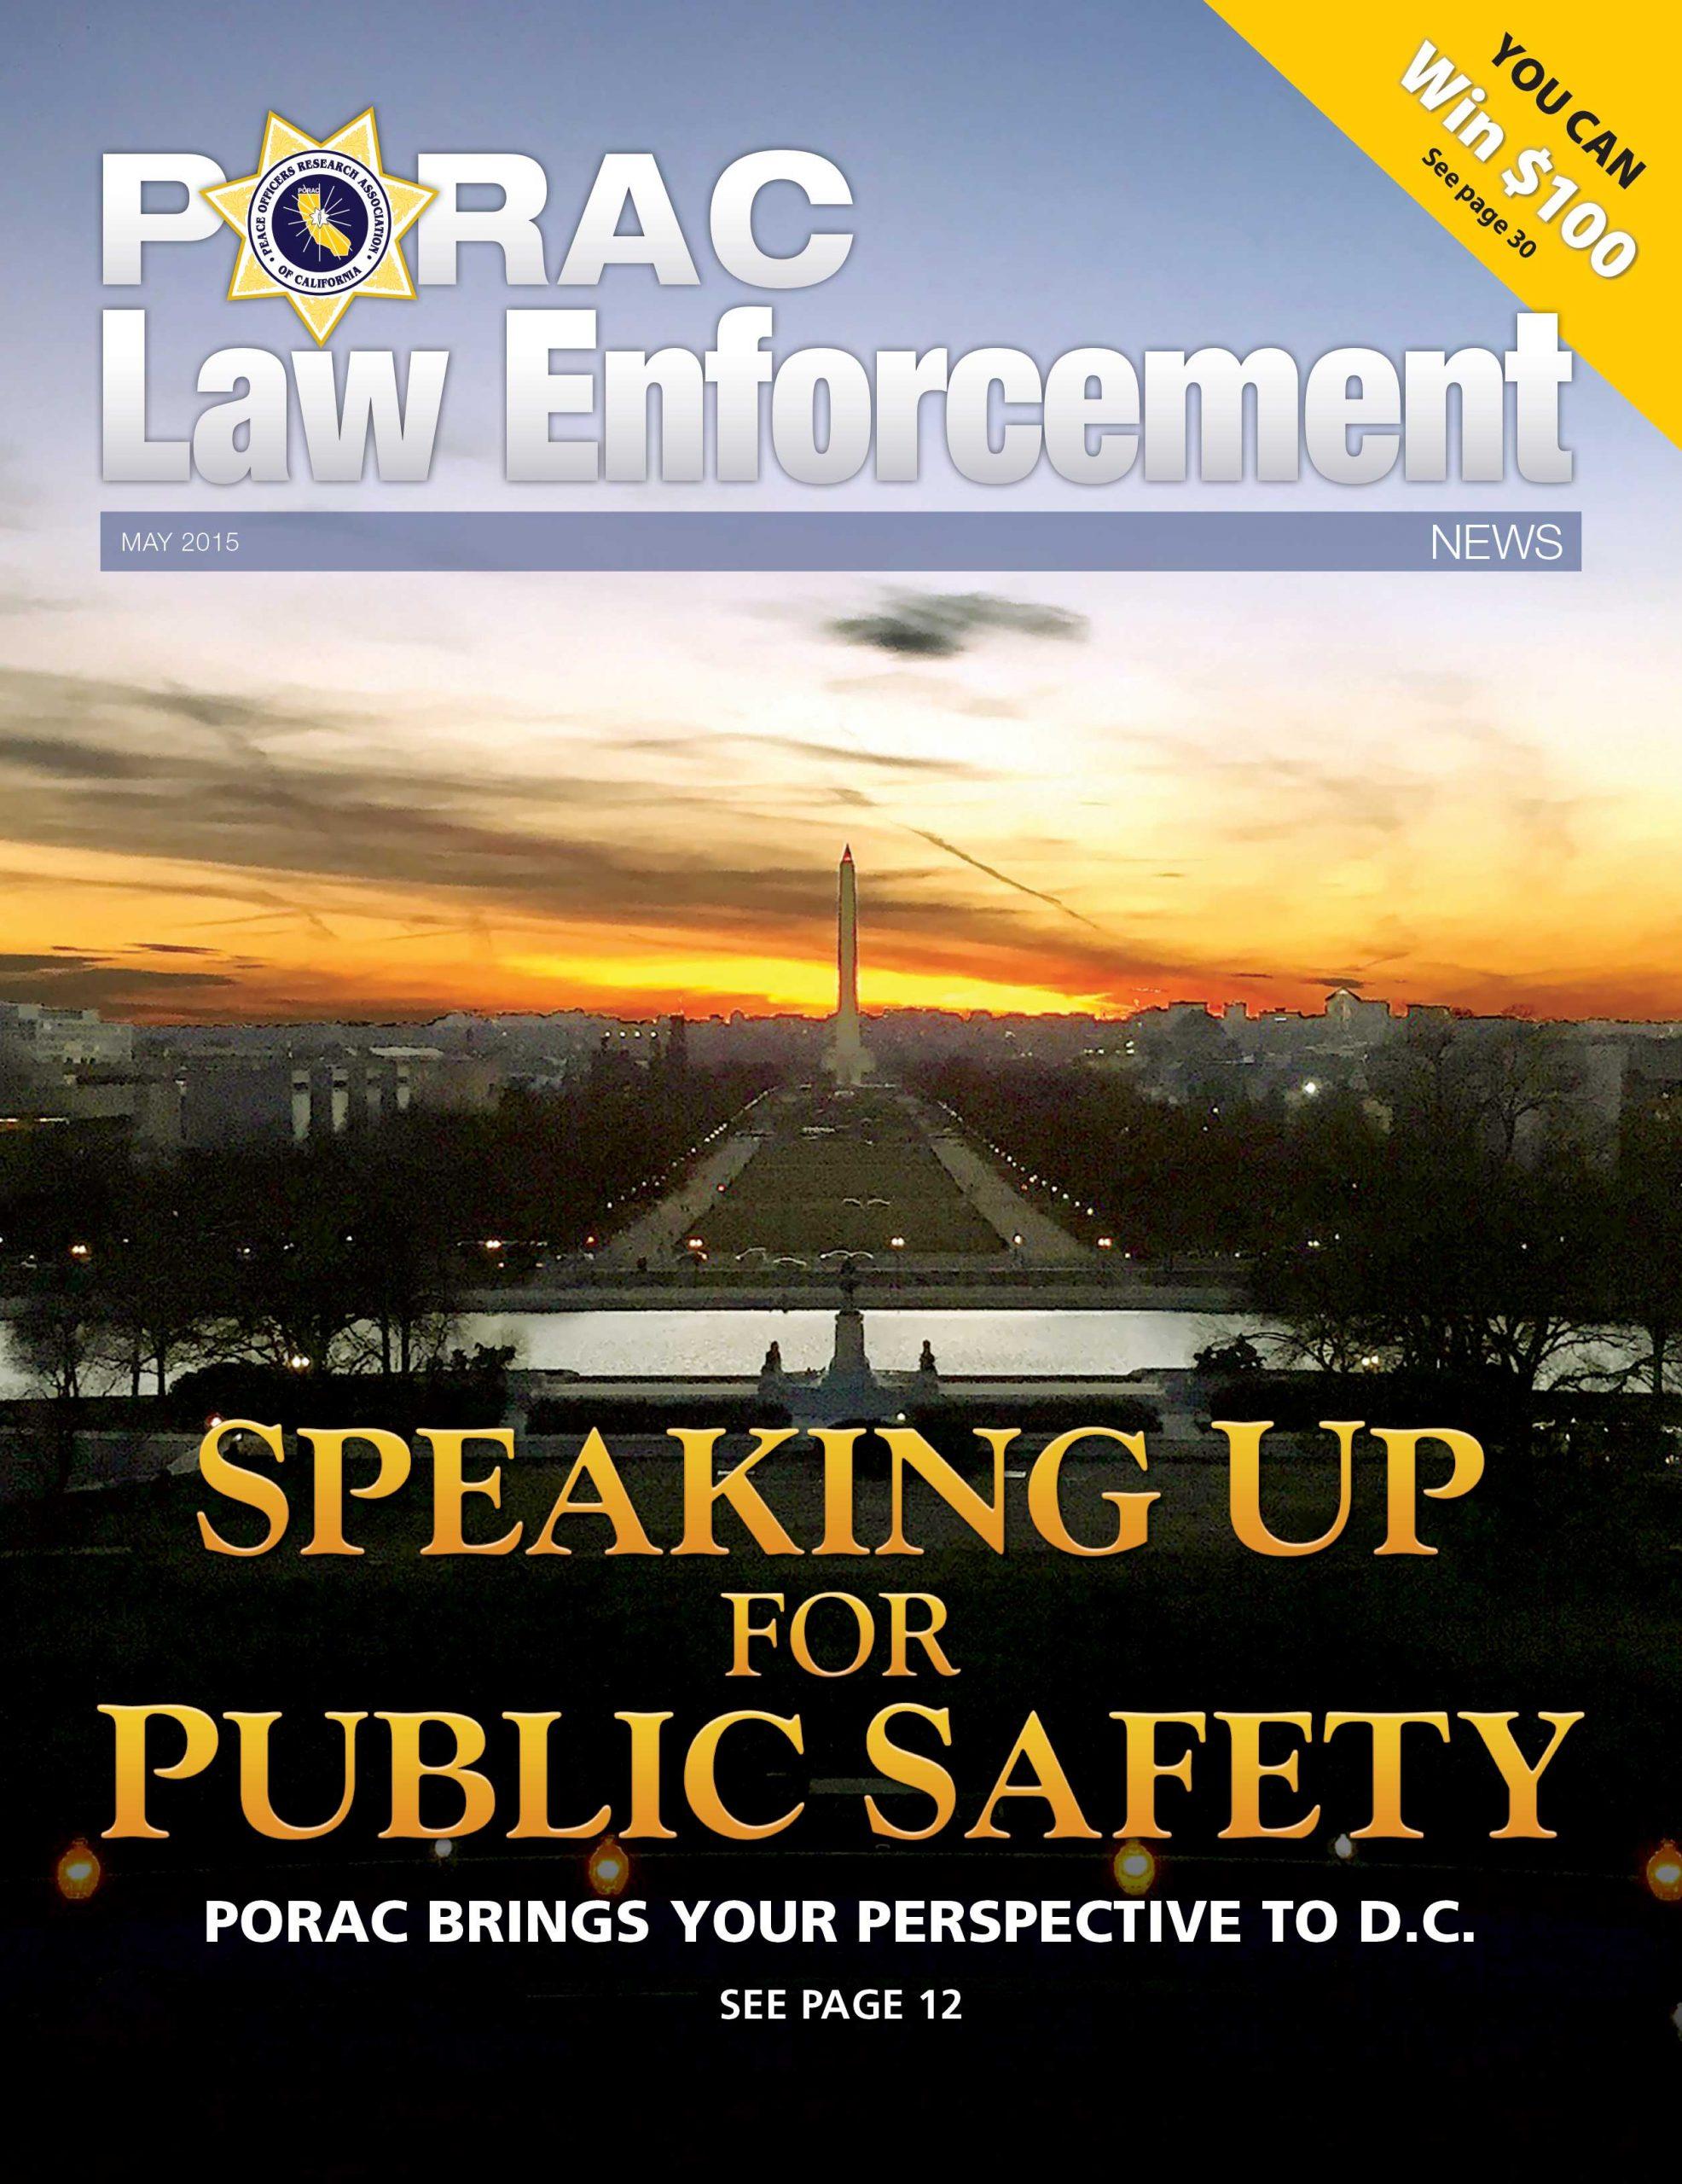 PORAC Law Enforcement News – May 2015